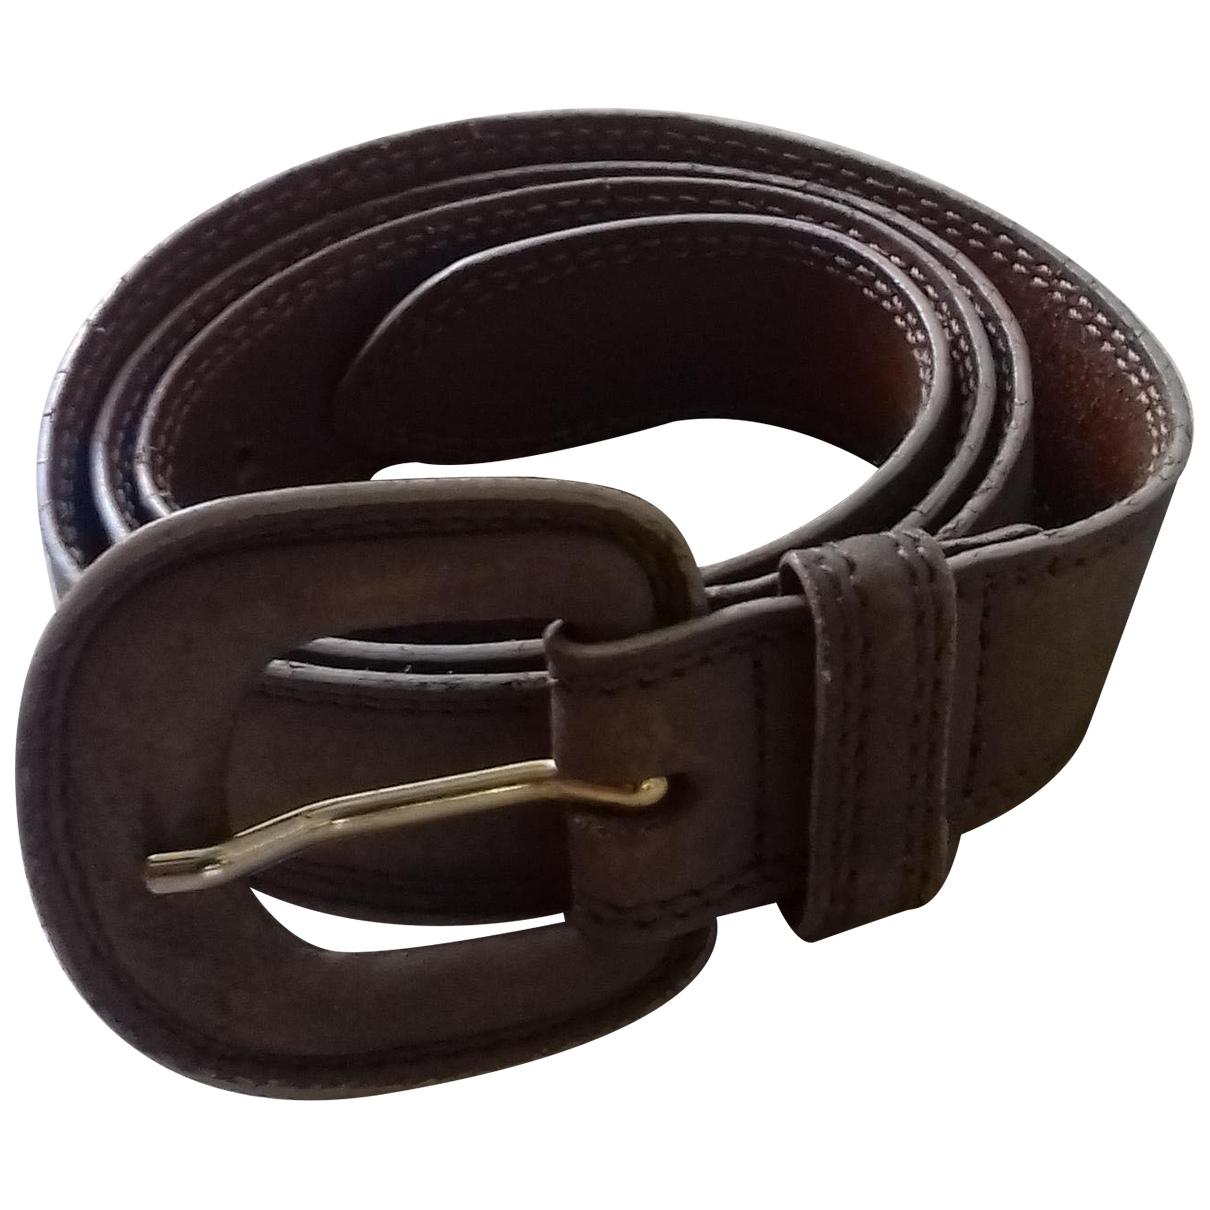 Gerard Darel \N Brown Leather belt for Women 70 cm